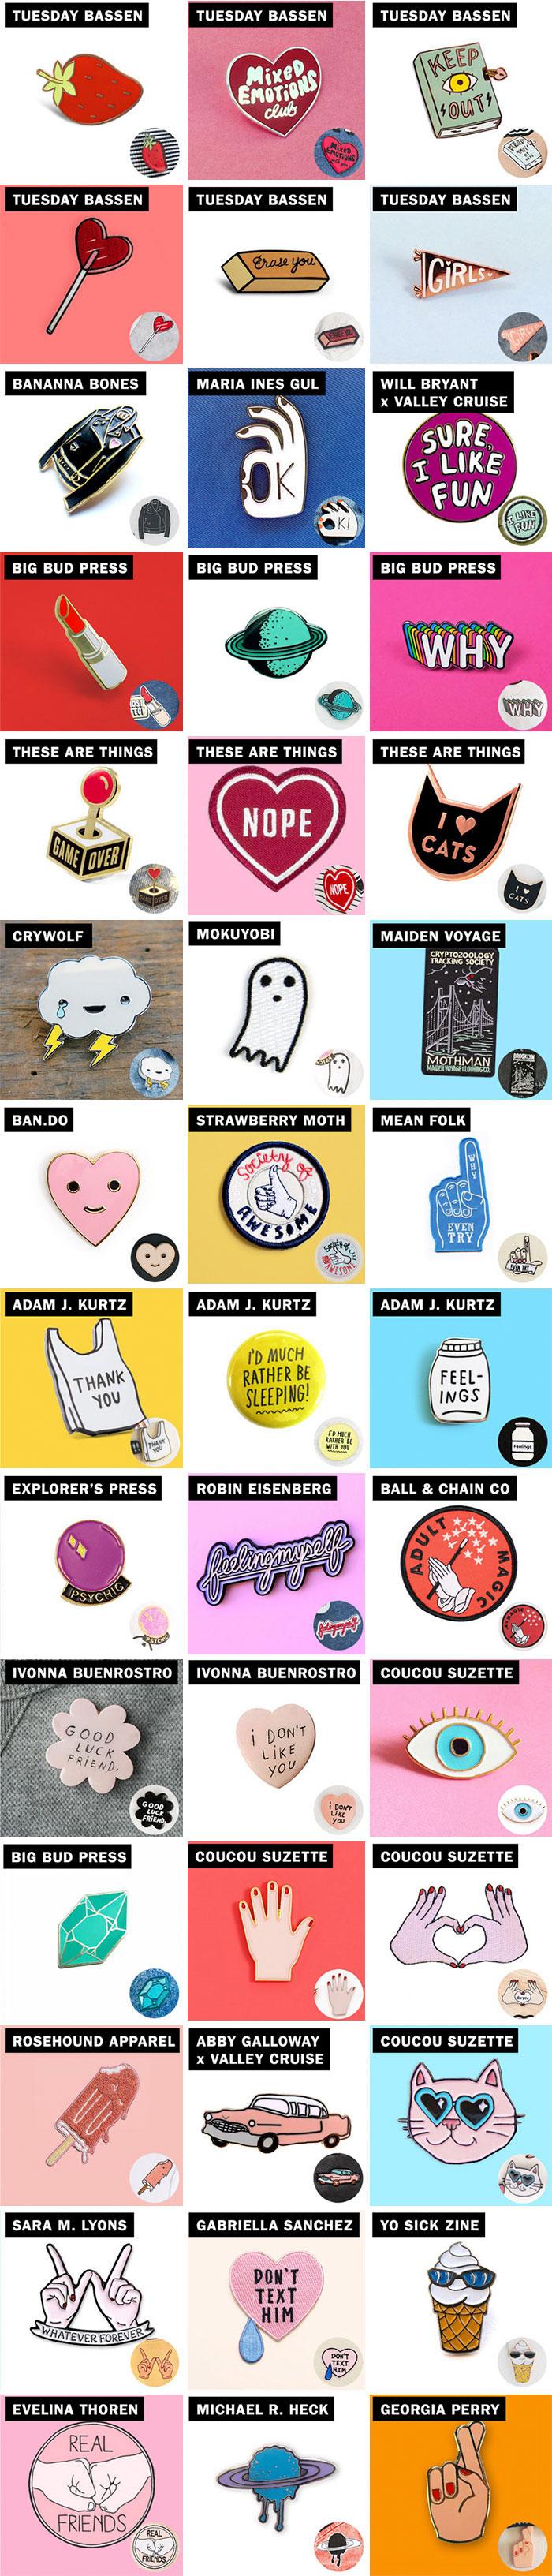 zara-stealing-designs-copying-independent-artists-tuesday-bassen-15